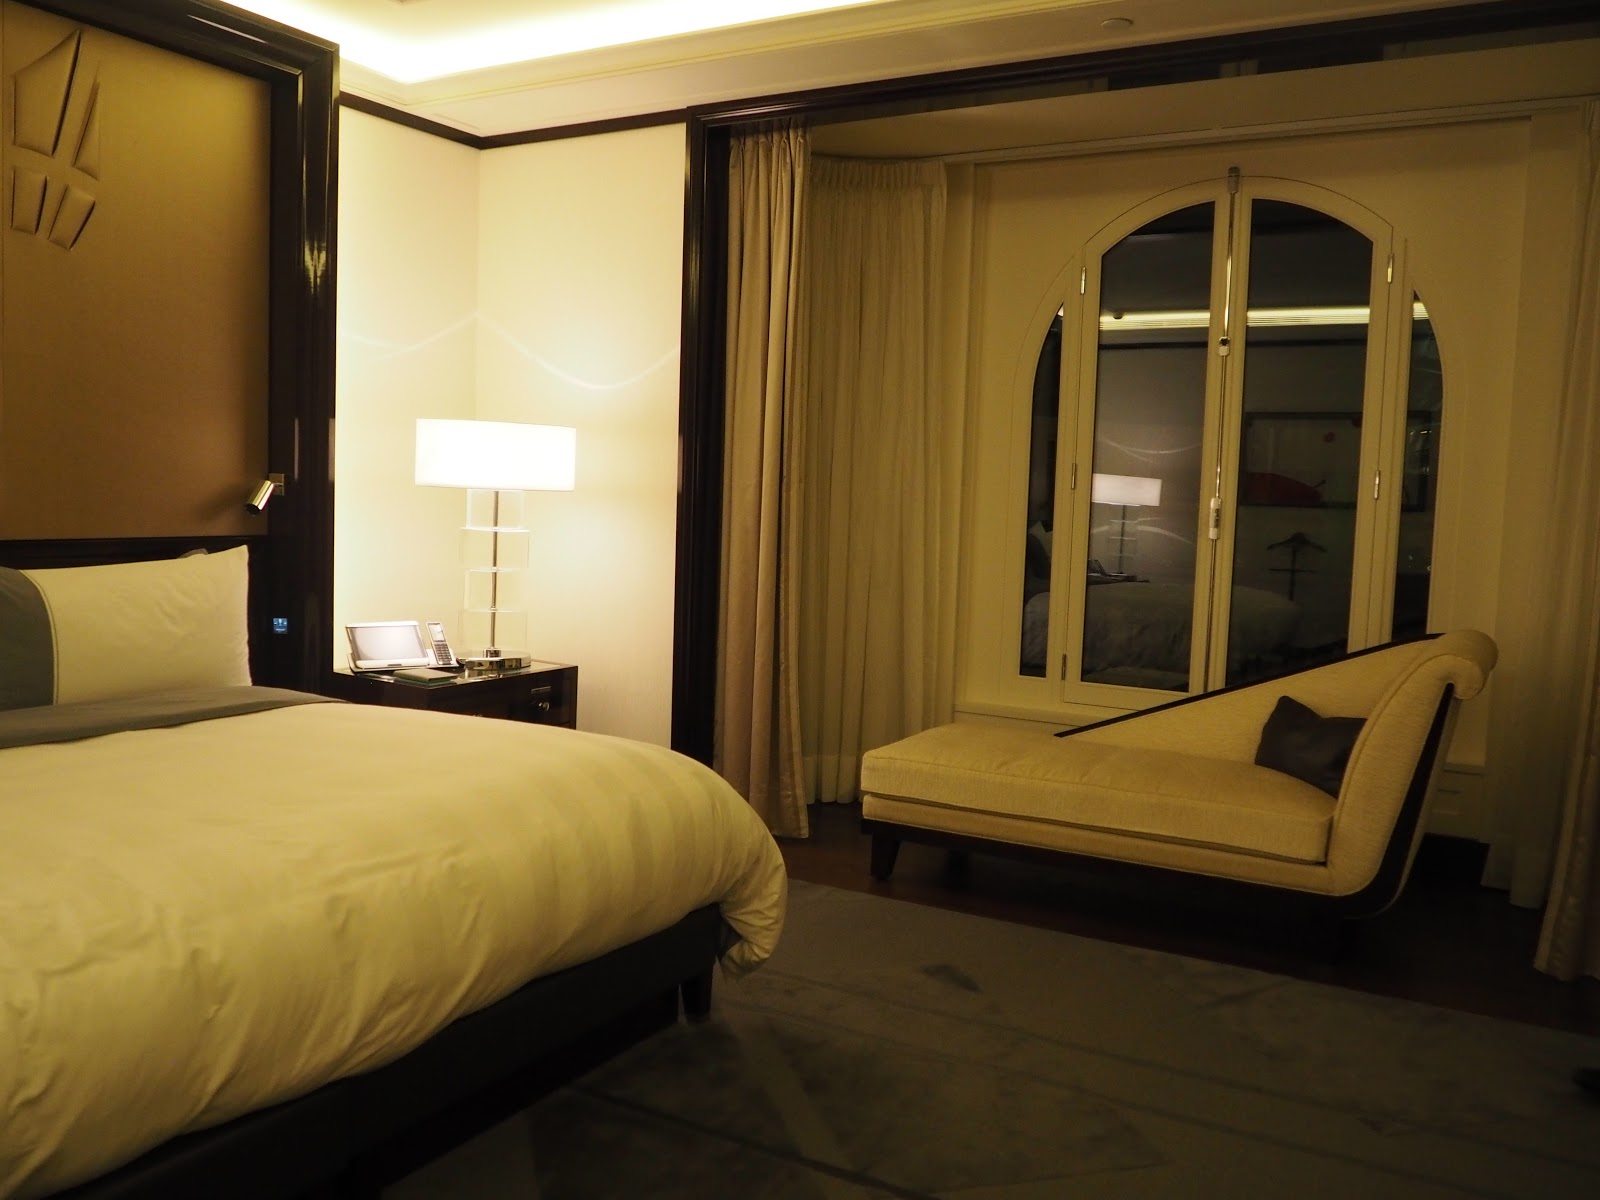 Grand Premier Suite, Peninsula Hotel, Paris, Bedroom